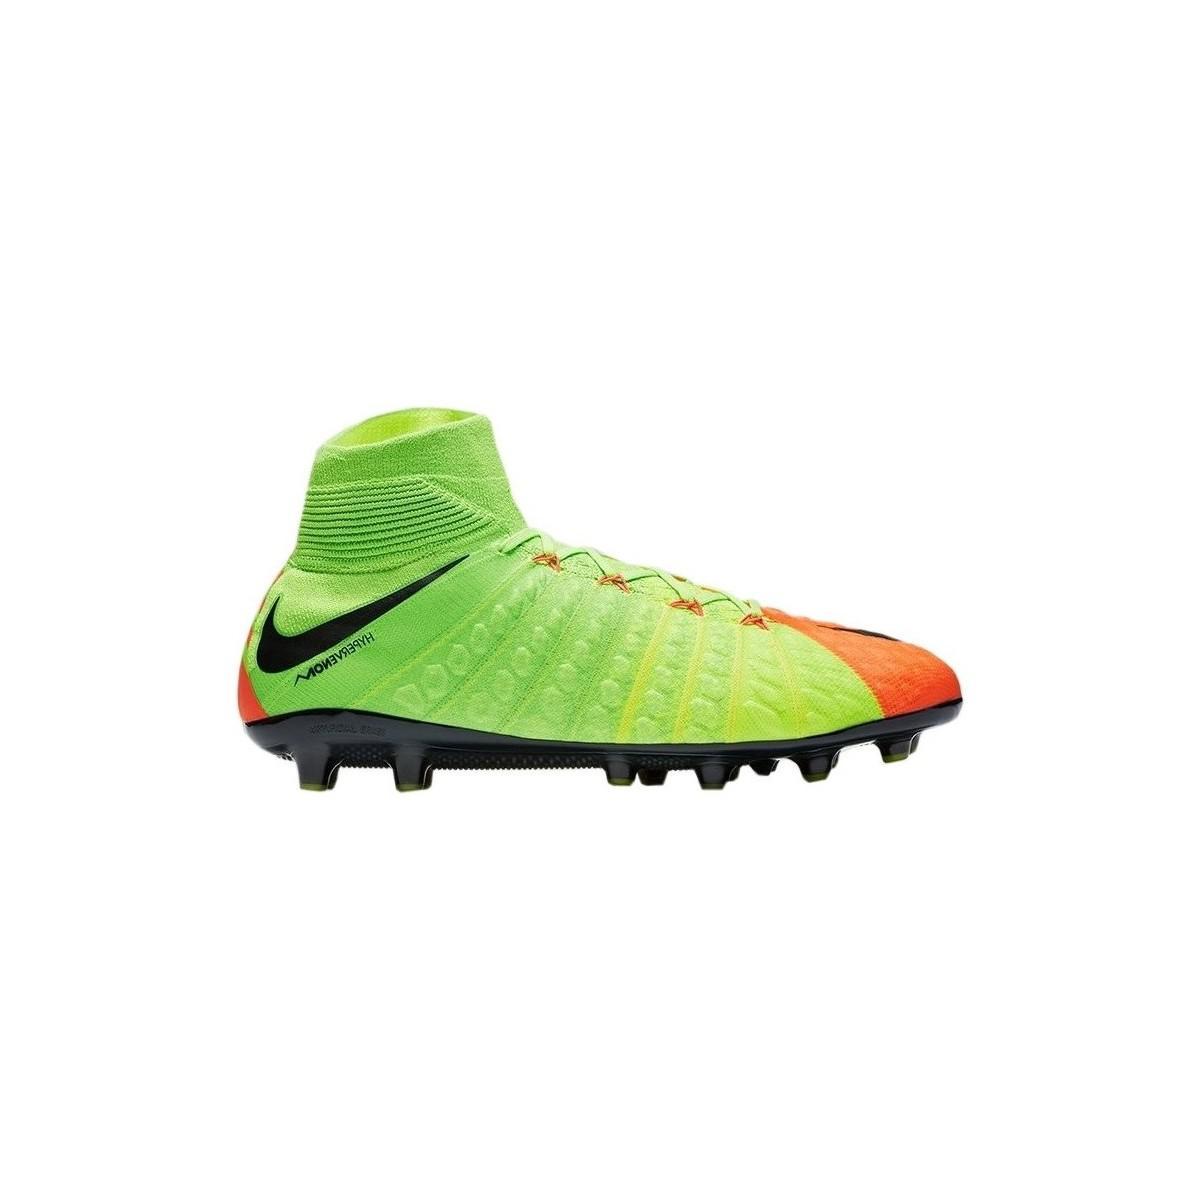 bae33a675 Nike Hypervenom Phantom Iii Df Agpro Men s Football Boots In Green ...